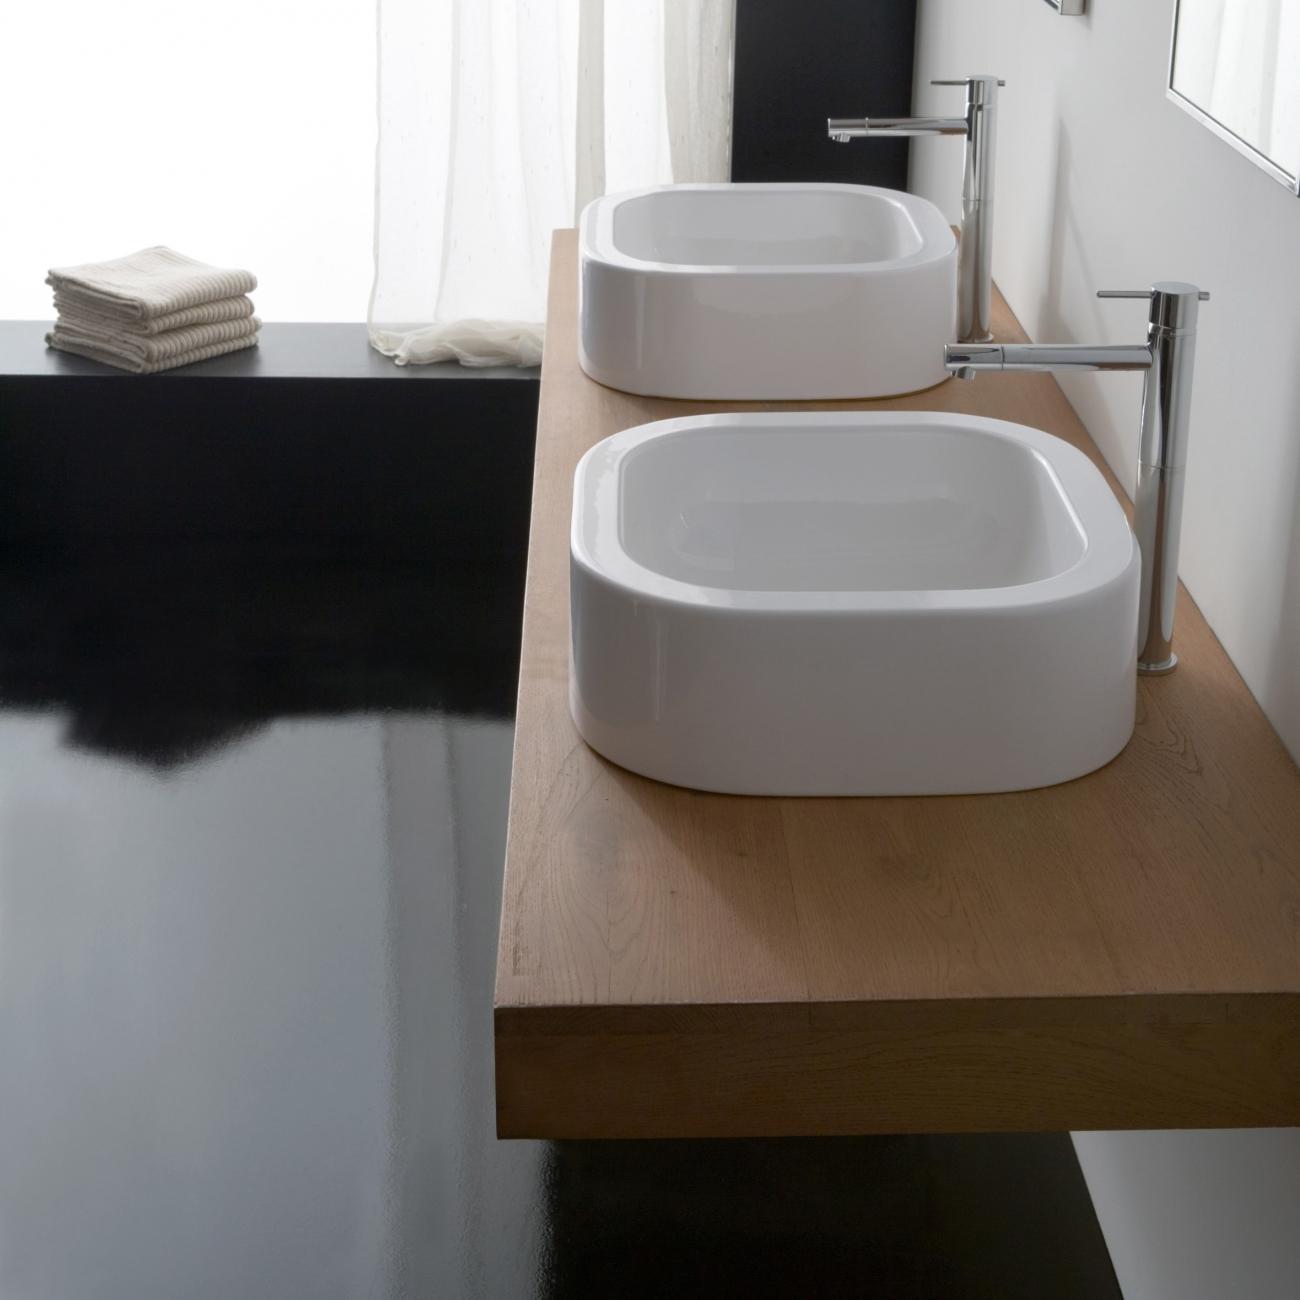 NEXT SCARABEO 40 Lay-on washbasin